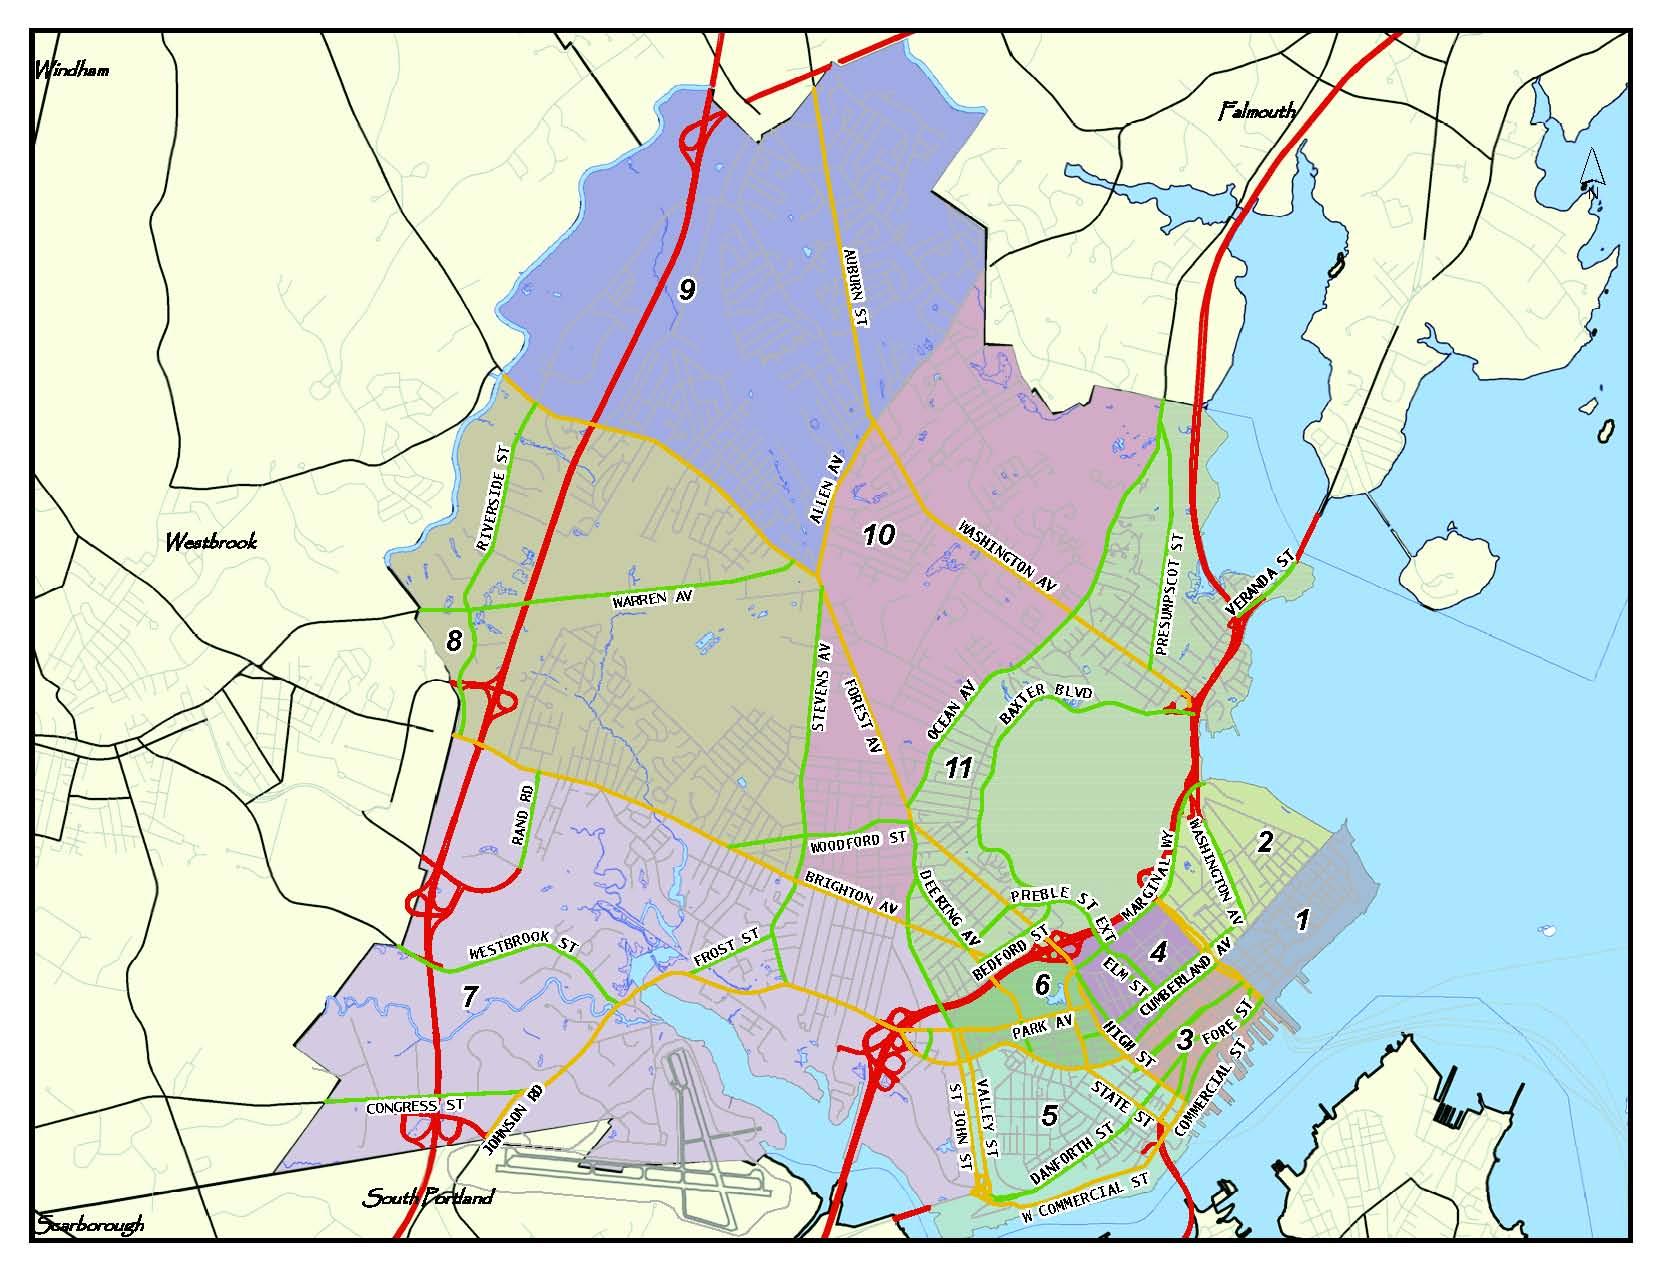 Portland Police sector mapخريطة قطاع شرطة بورتلاند